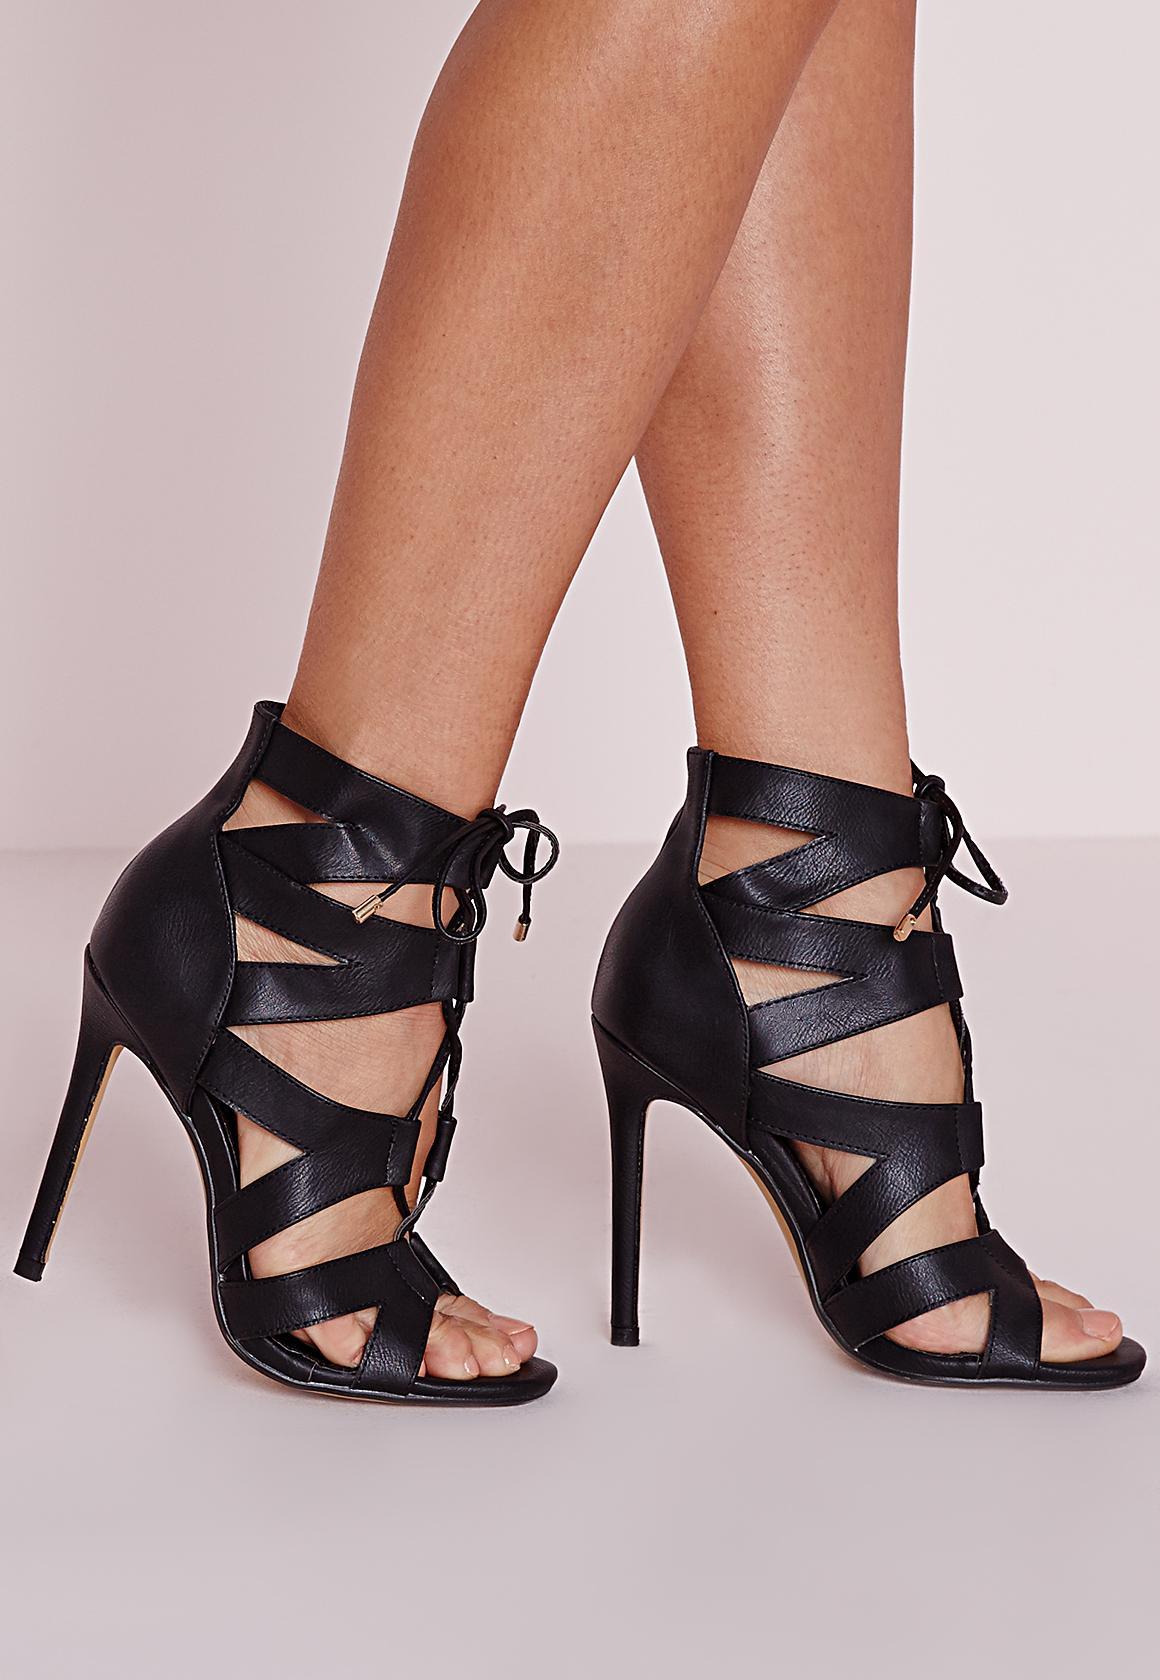 Cut Out Lace Up Gladiator Heels Black - Footwear - High Heels ...